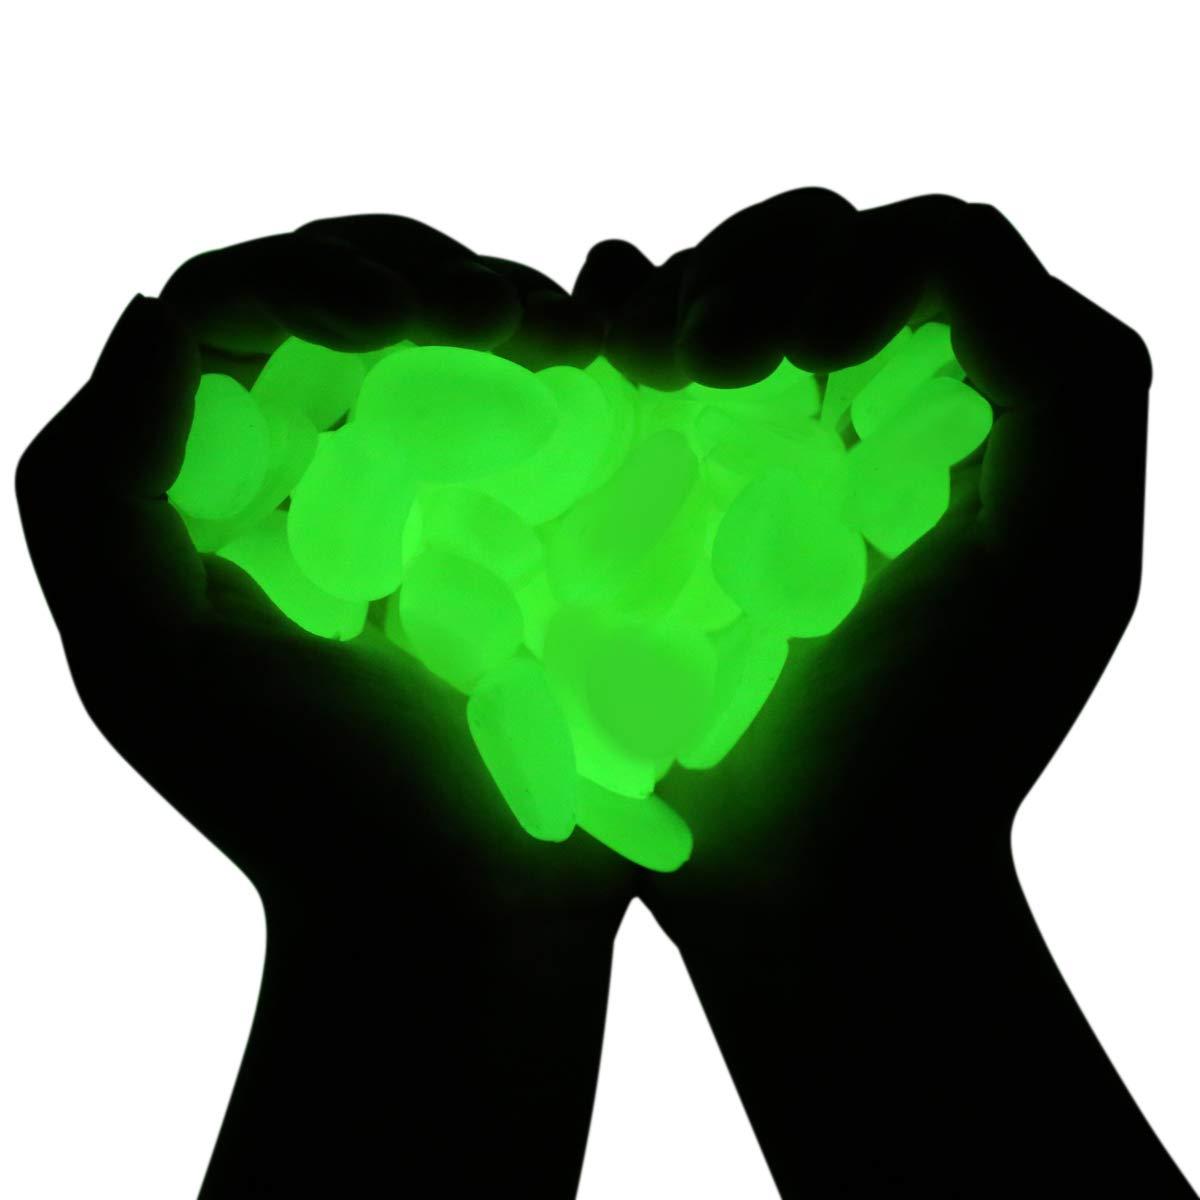 MEYUEWAL Glow in The Dark Pebbles 200PCS Glow Stones Luminous Pebbles for Walkways, Path, Gardens, Lawns, Driveways, Plants, Fish Tank, Aquarium (Green)